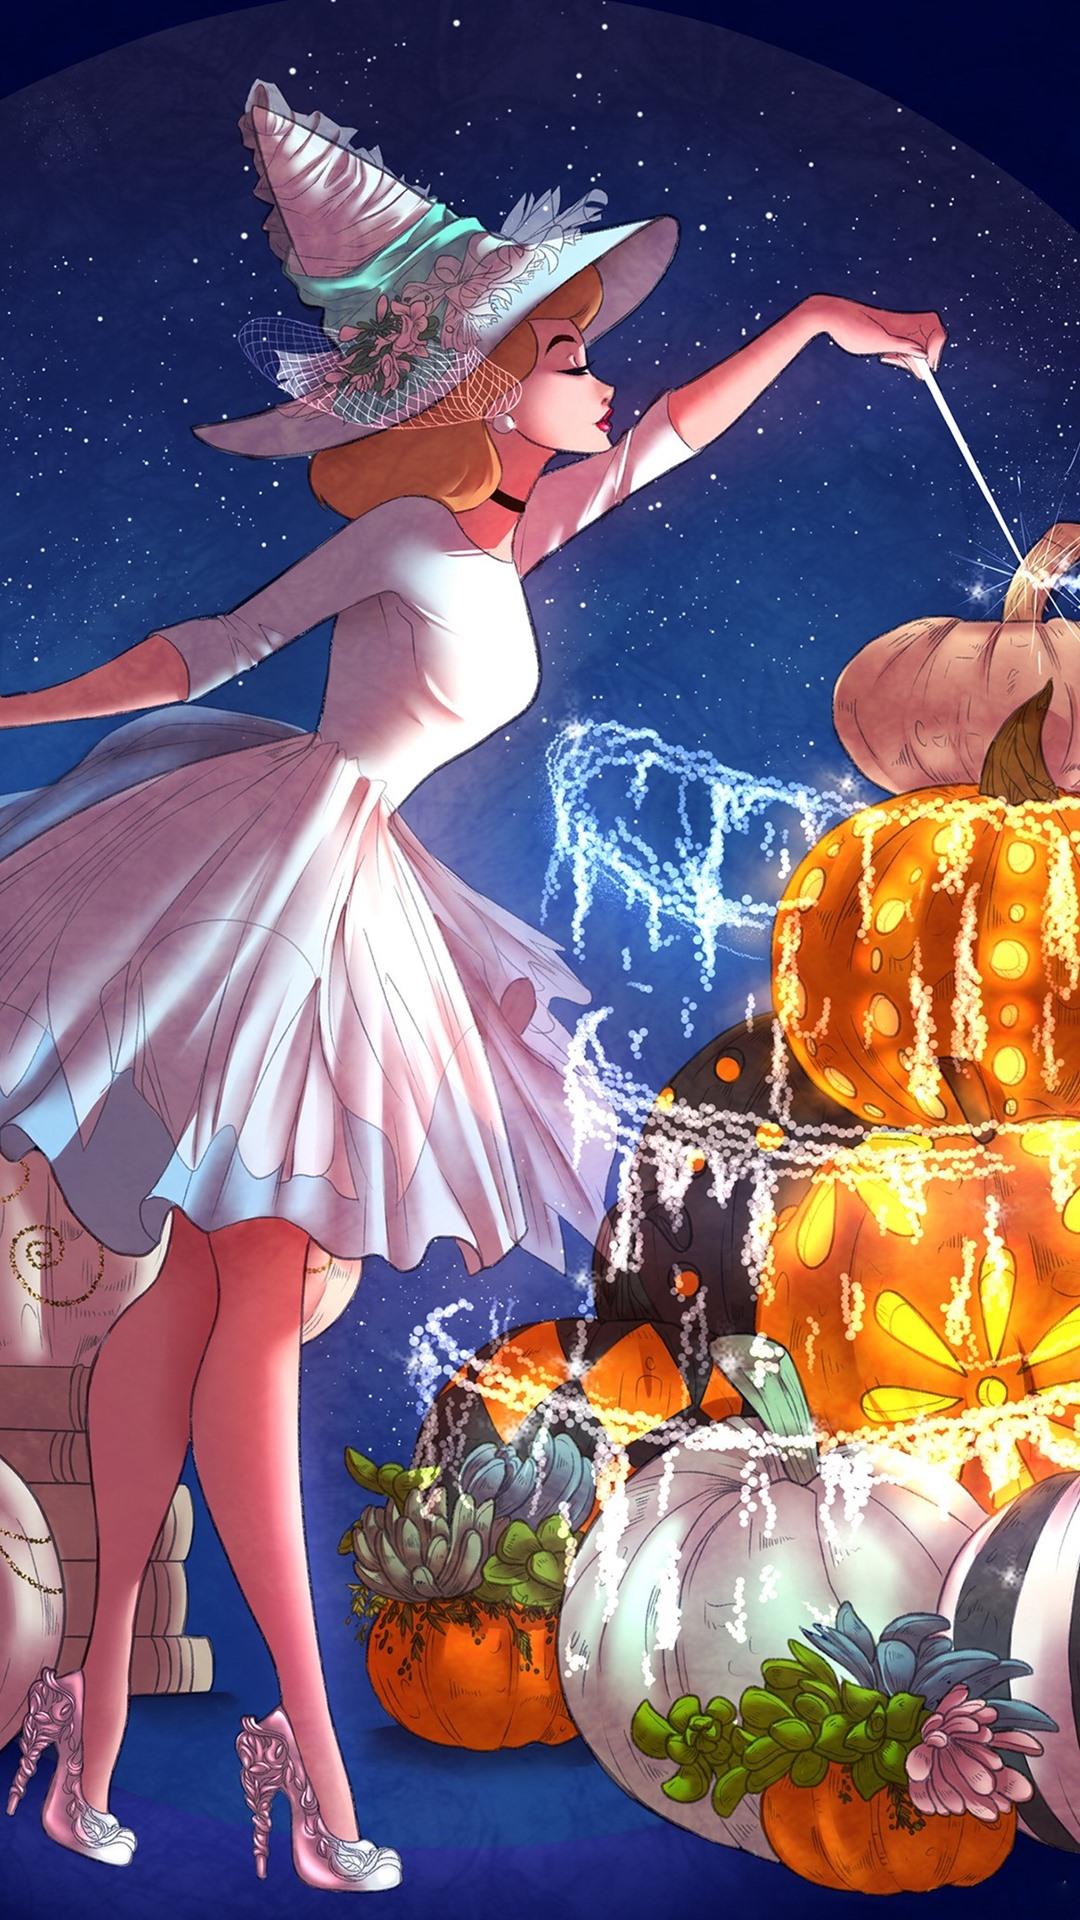 Magic Girl Pumpkin Anime 1080x1920 Iphone 8 7 6 6s Plus